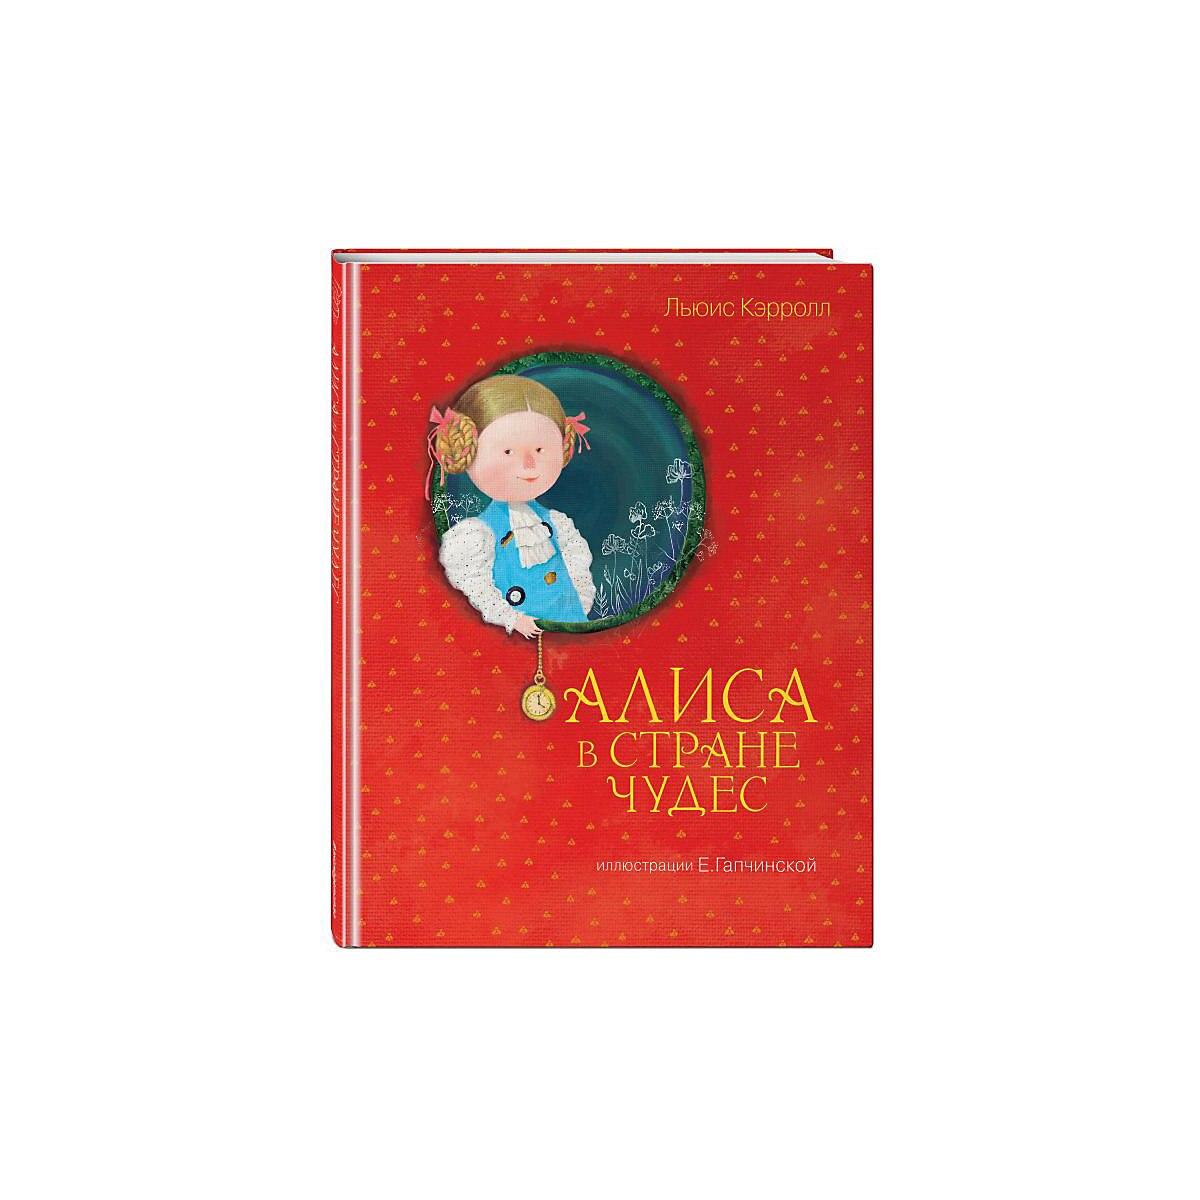 Books EKSMO 8361118 Children Education Encyclopedia Alphabet Dictionary Book For Baby MTpromo